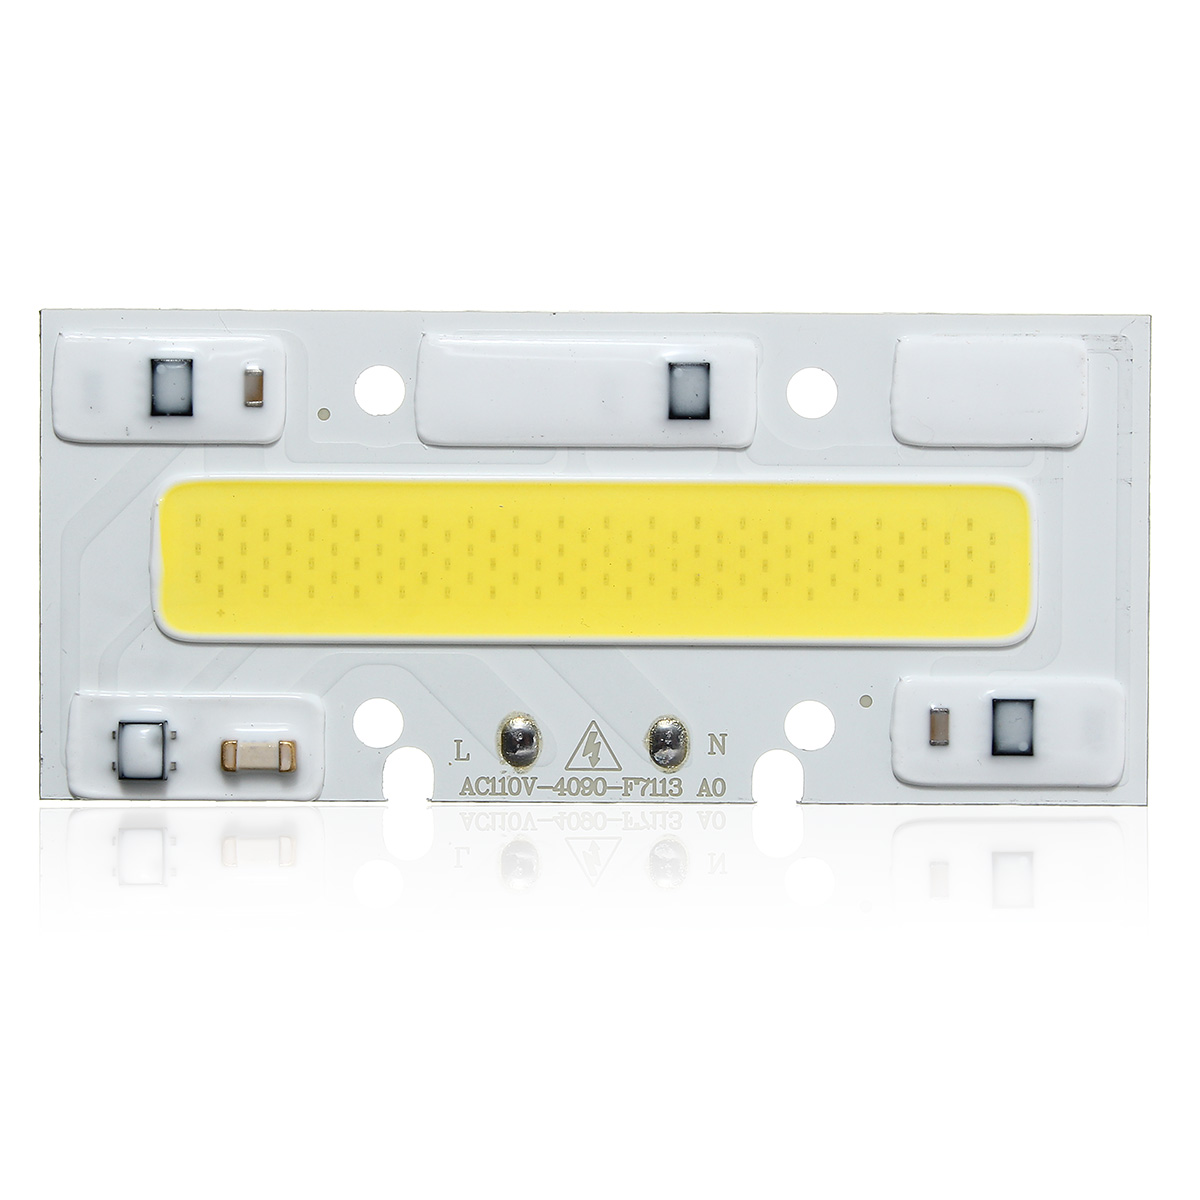 40 X 90MM 30W 2600LM Warm/White DIY COB LED Chip Bulb Bead For Flood Light AC110/220V